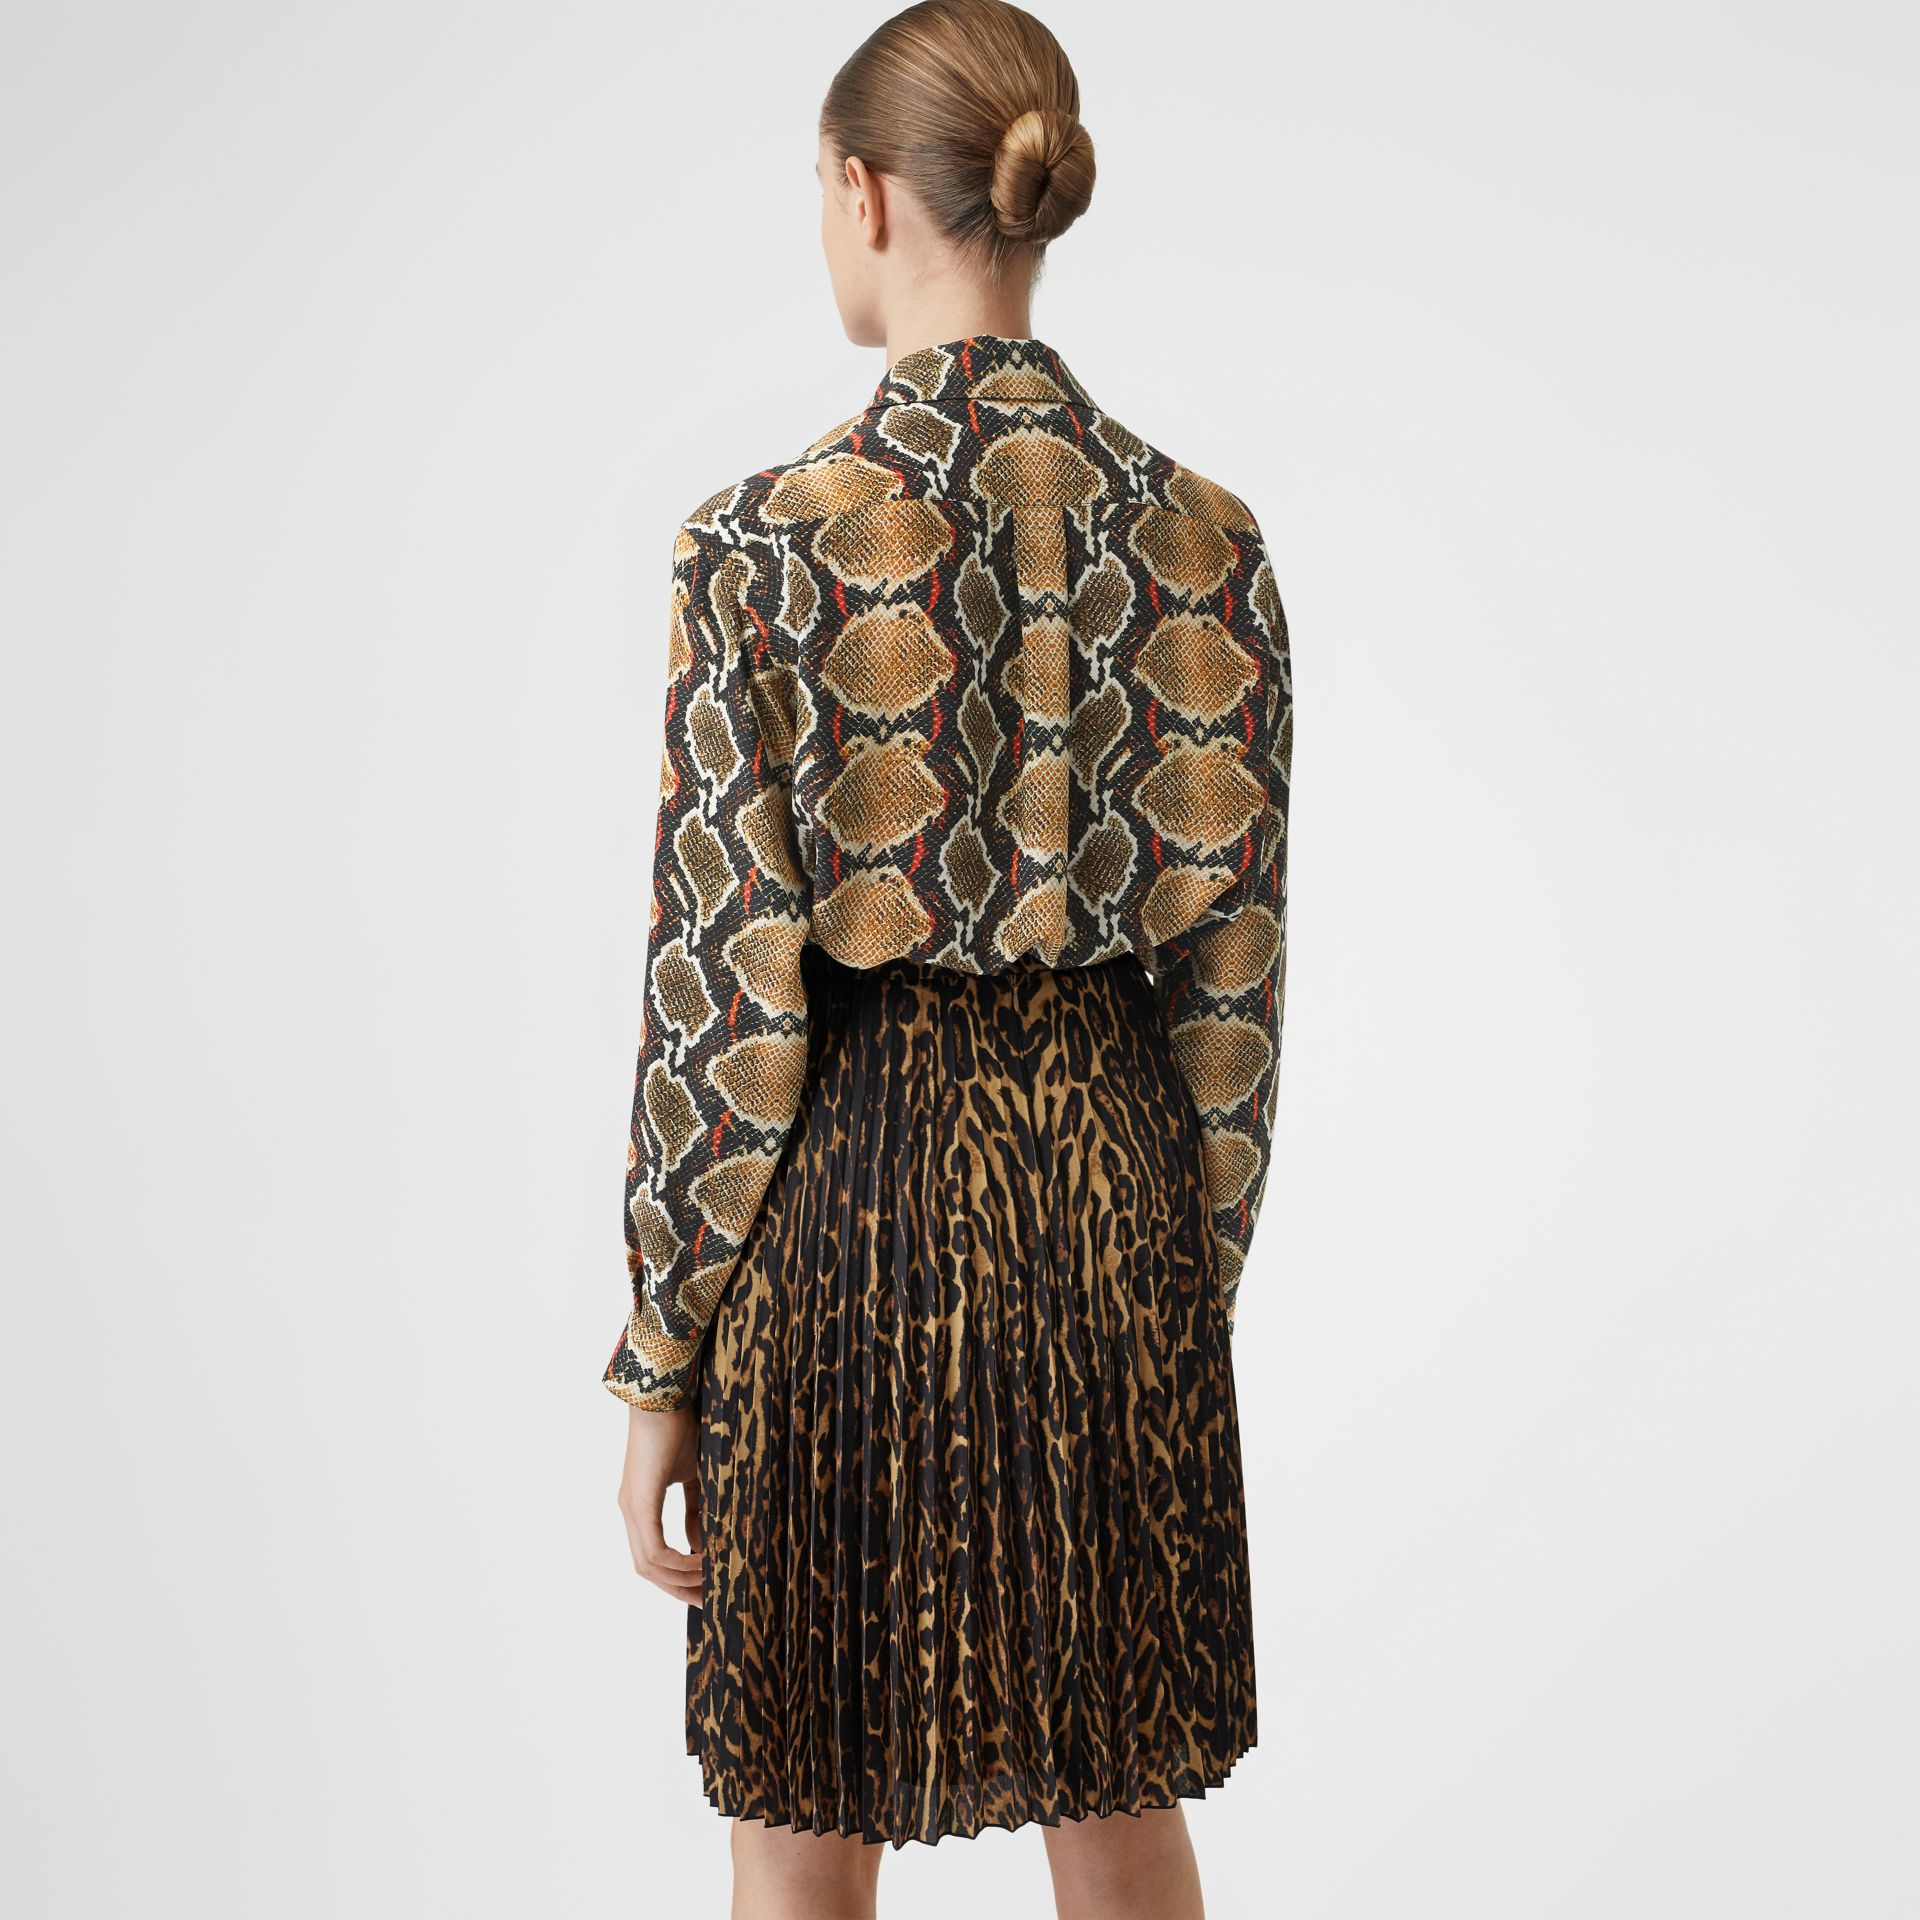 Python Print Silk Shirt in Soft Cocoa - Women | Burberry United Kingdom - gallery image 2